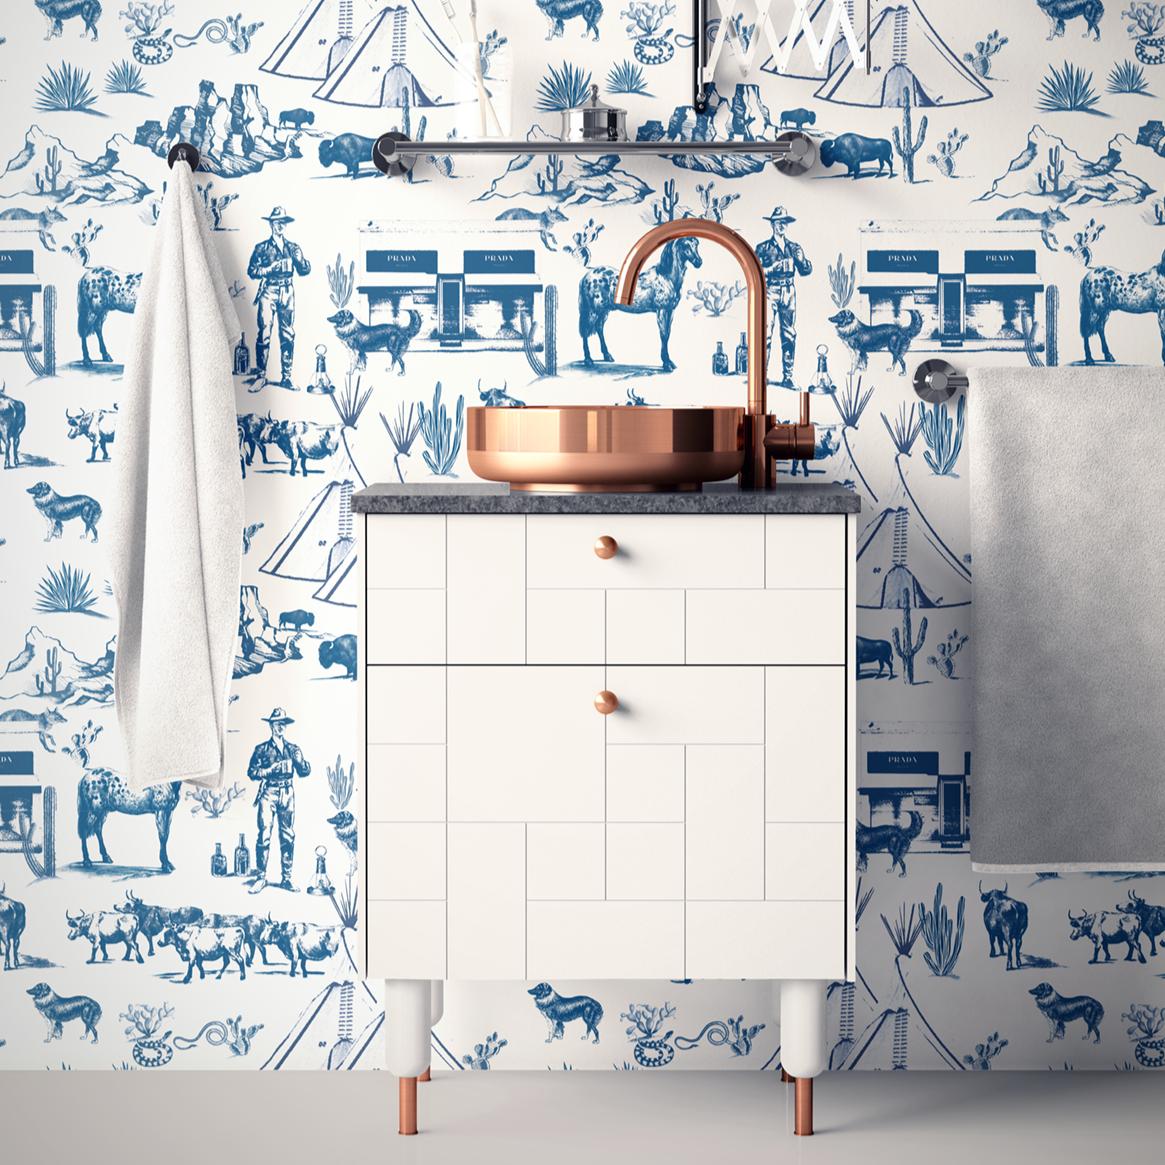 Marfa Toile Peel Stick Wallpaper Toile Wallpaper Boys Bedroom Wallpaper Katie Kime Wallpaper